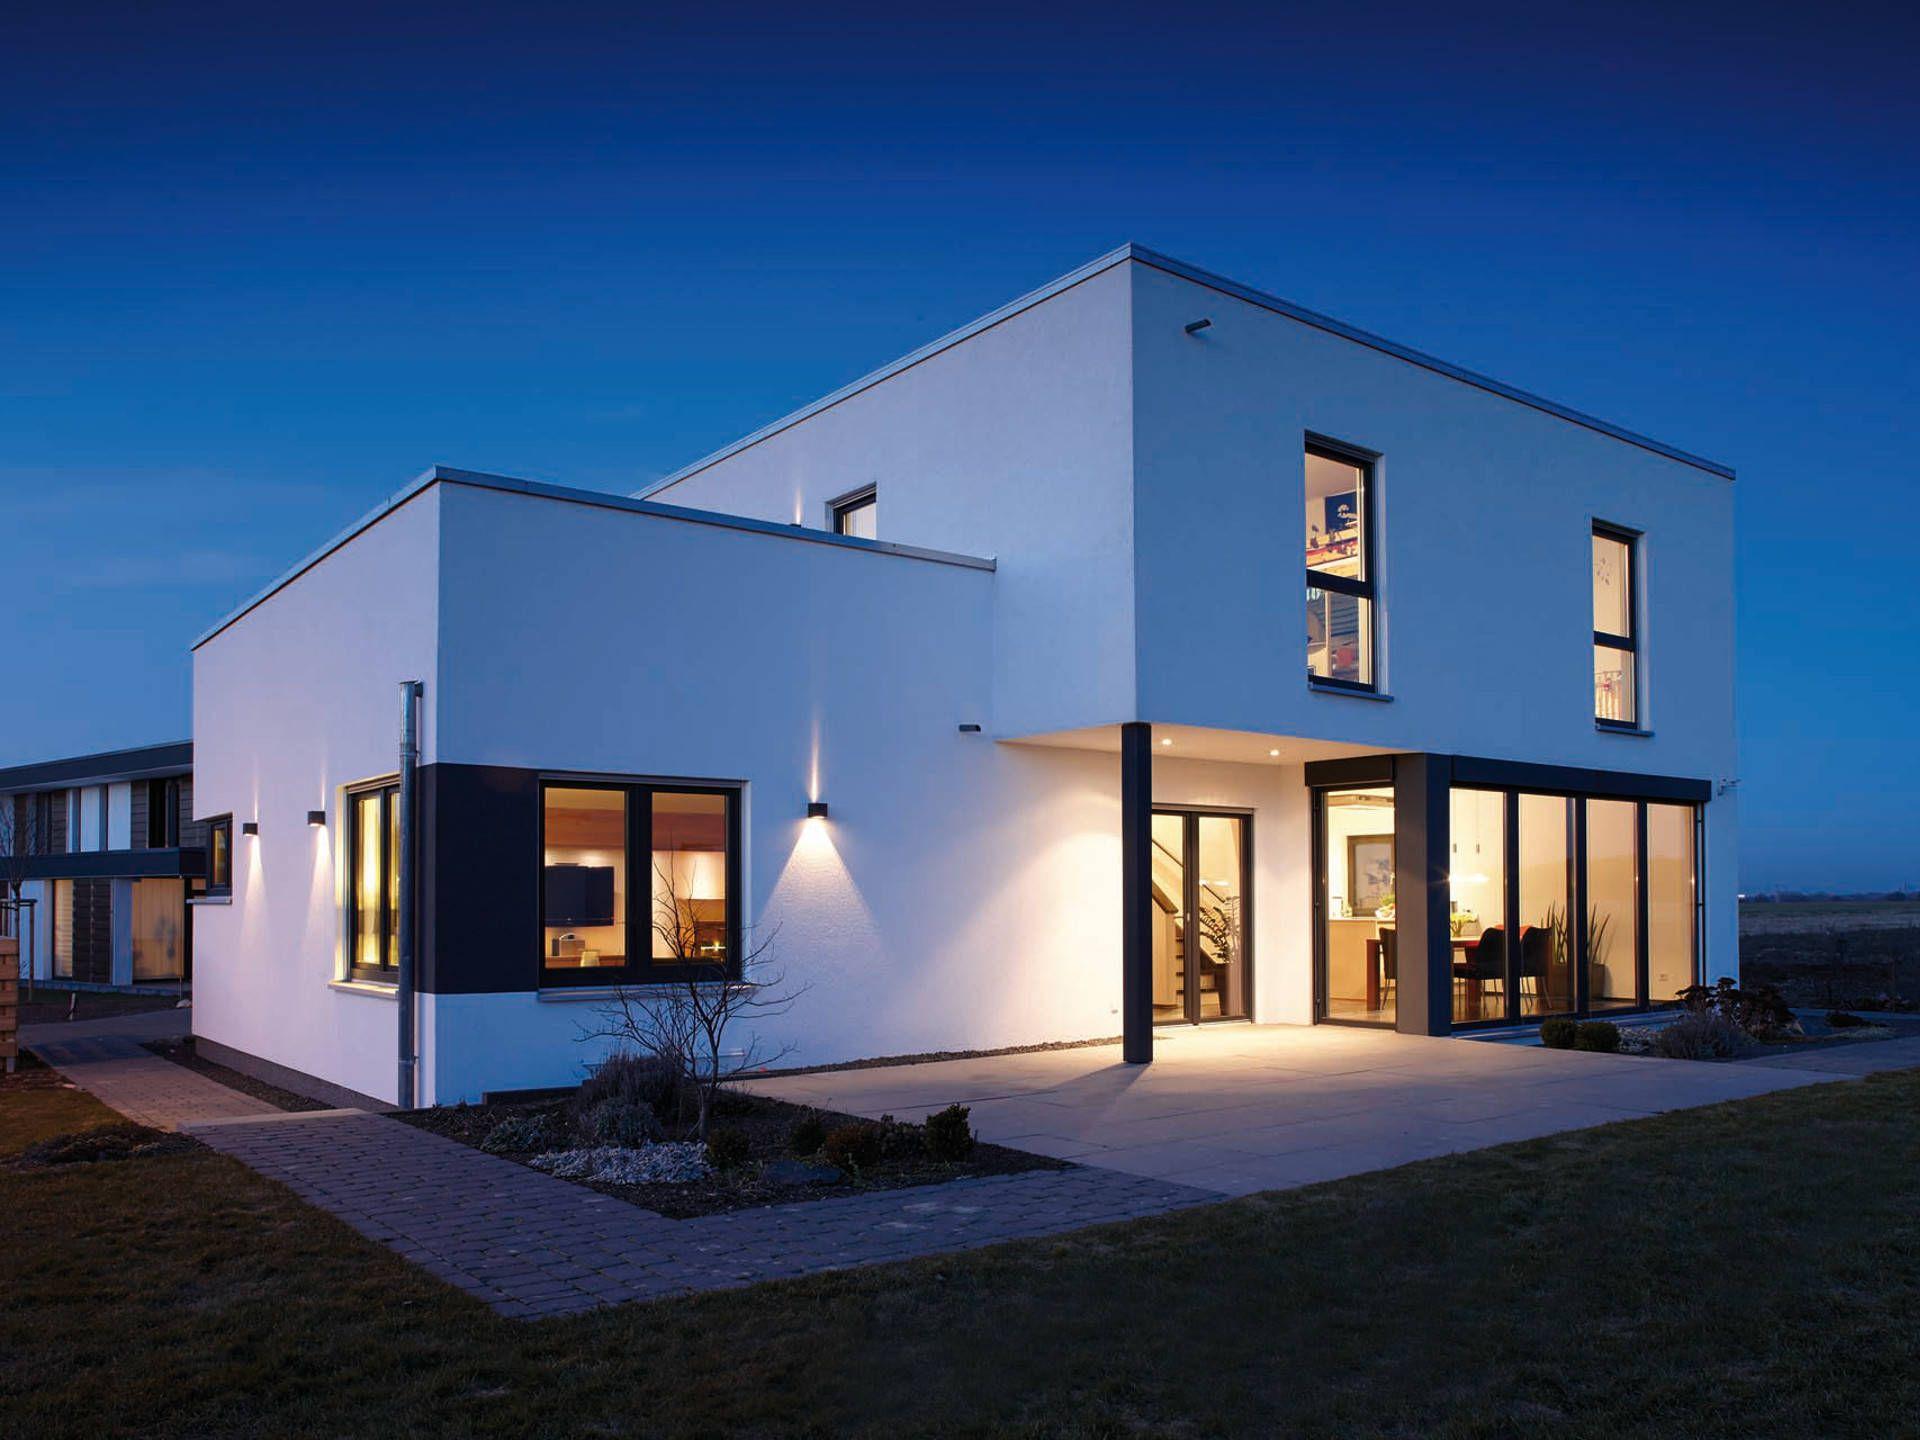 Architektur Trend Haus • Bauhaus, Cubus von FingerHaus ...